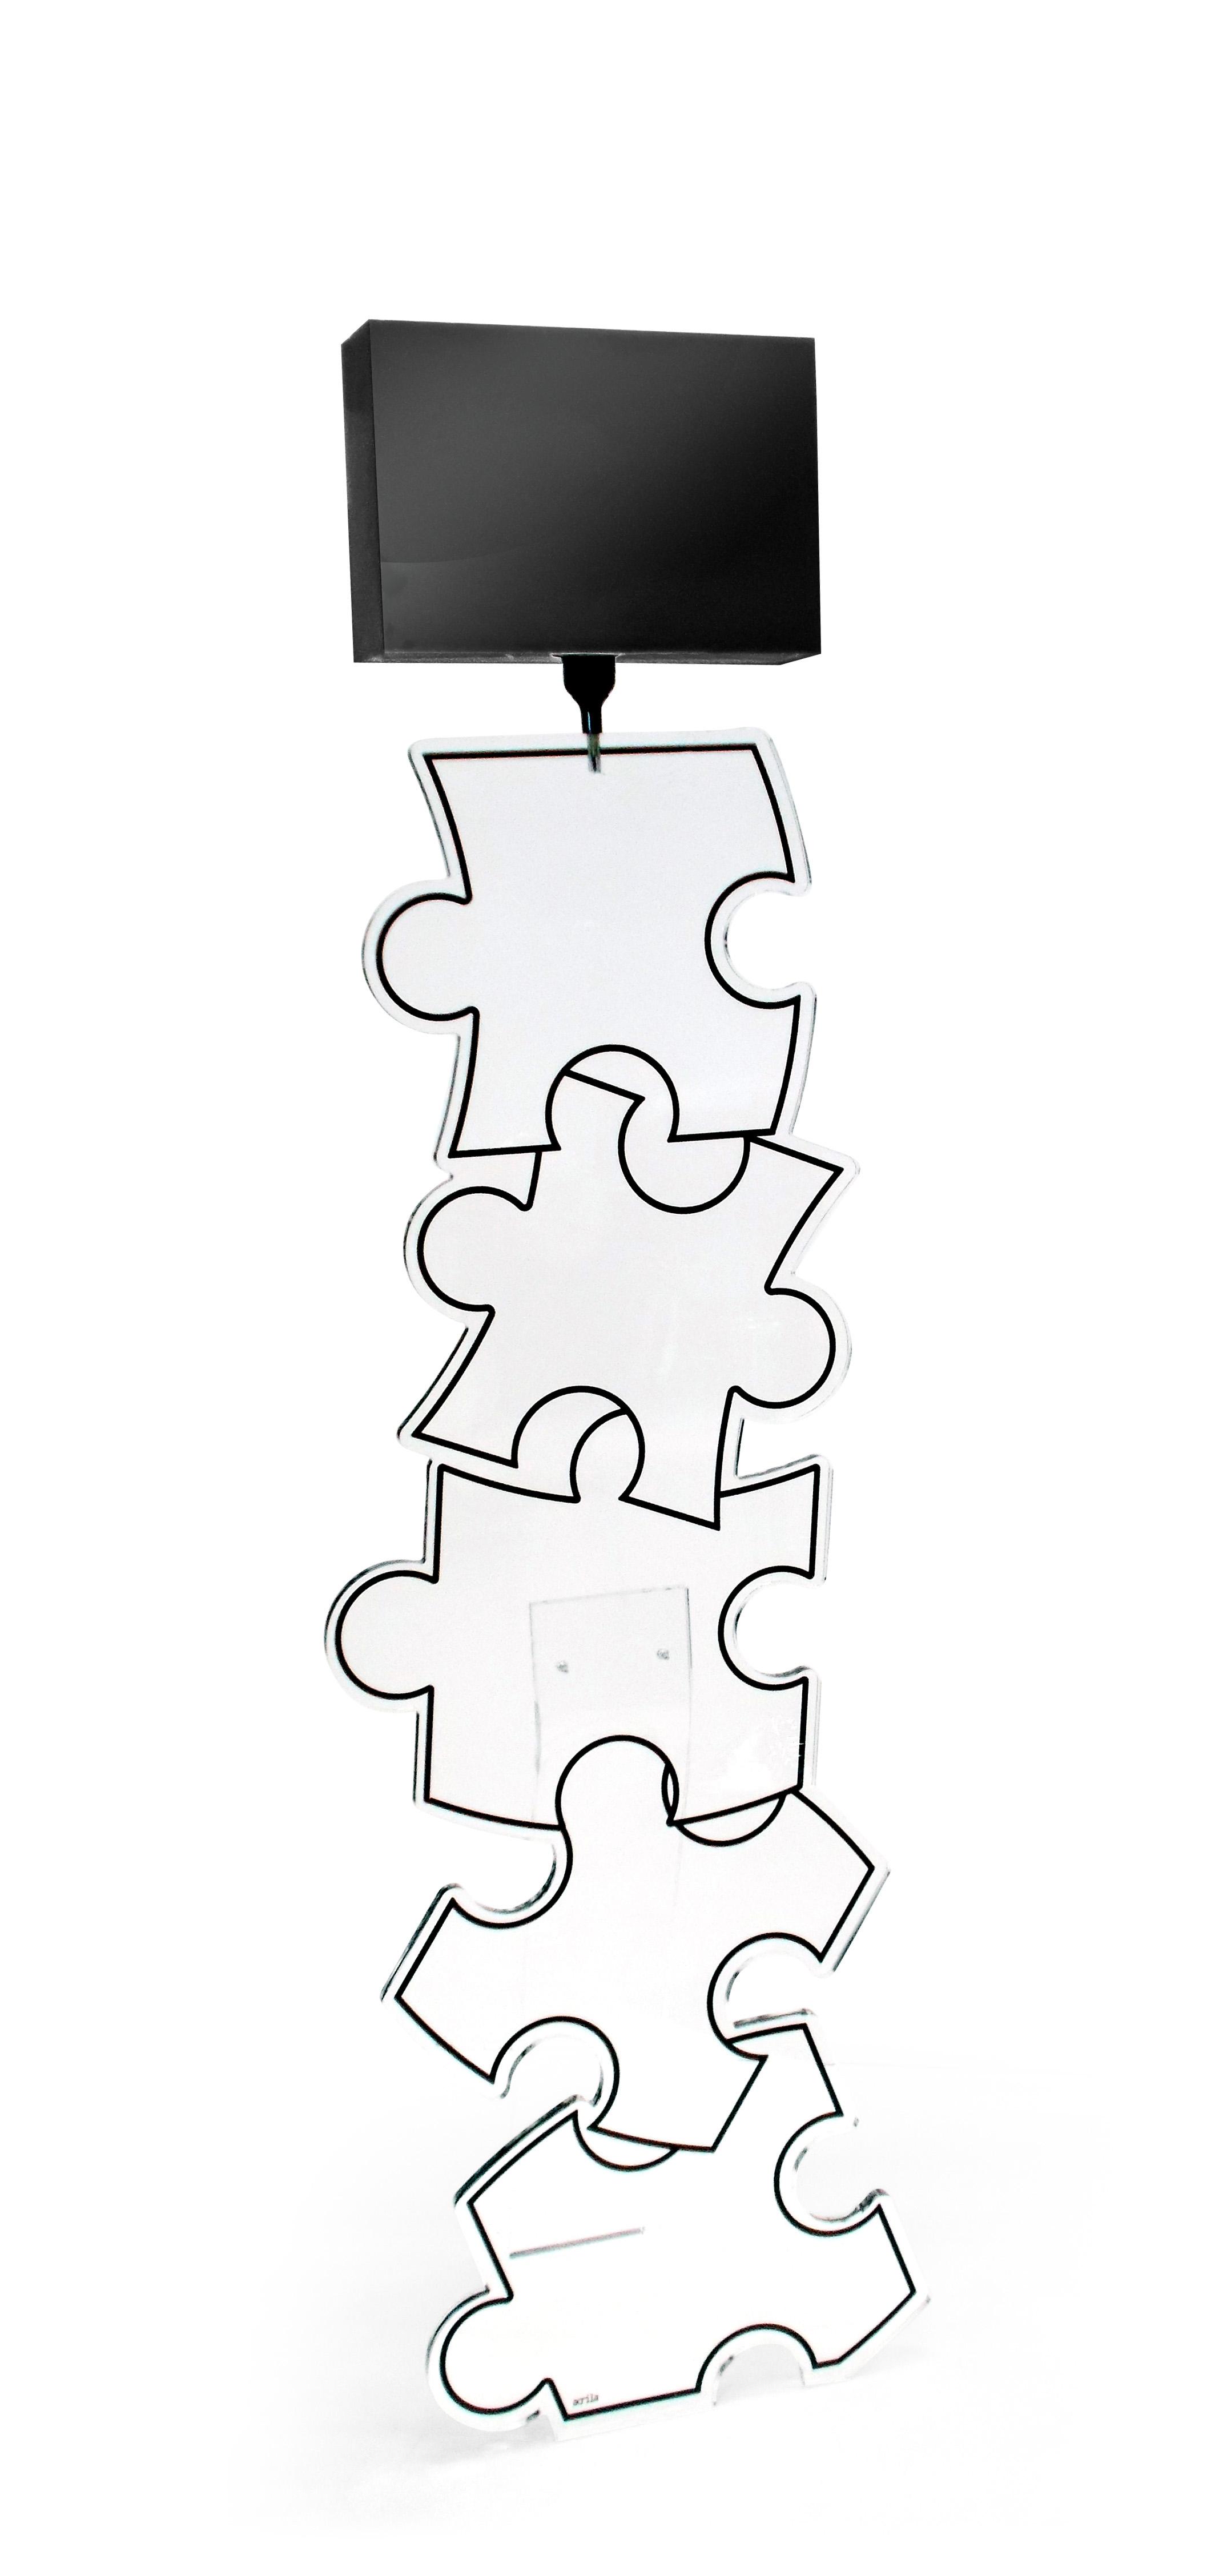 LUM puzzle gd 1332.jpg